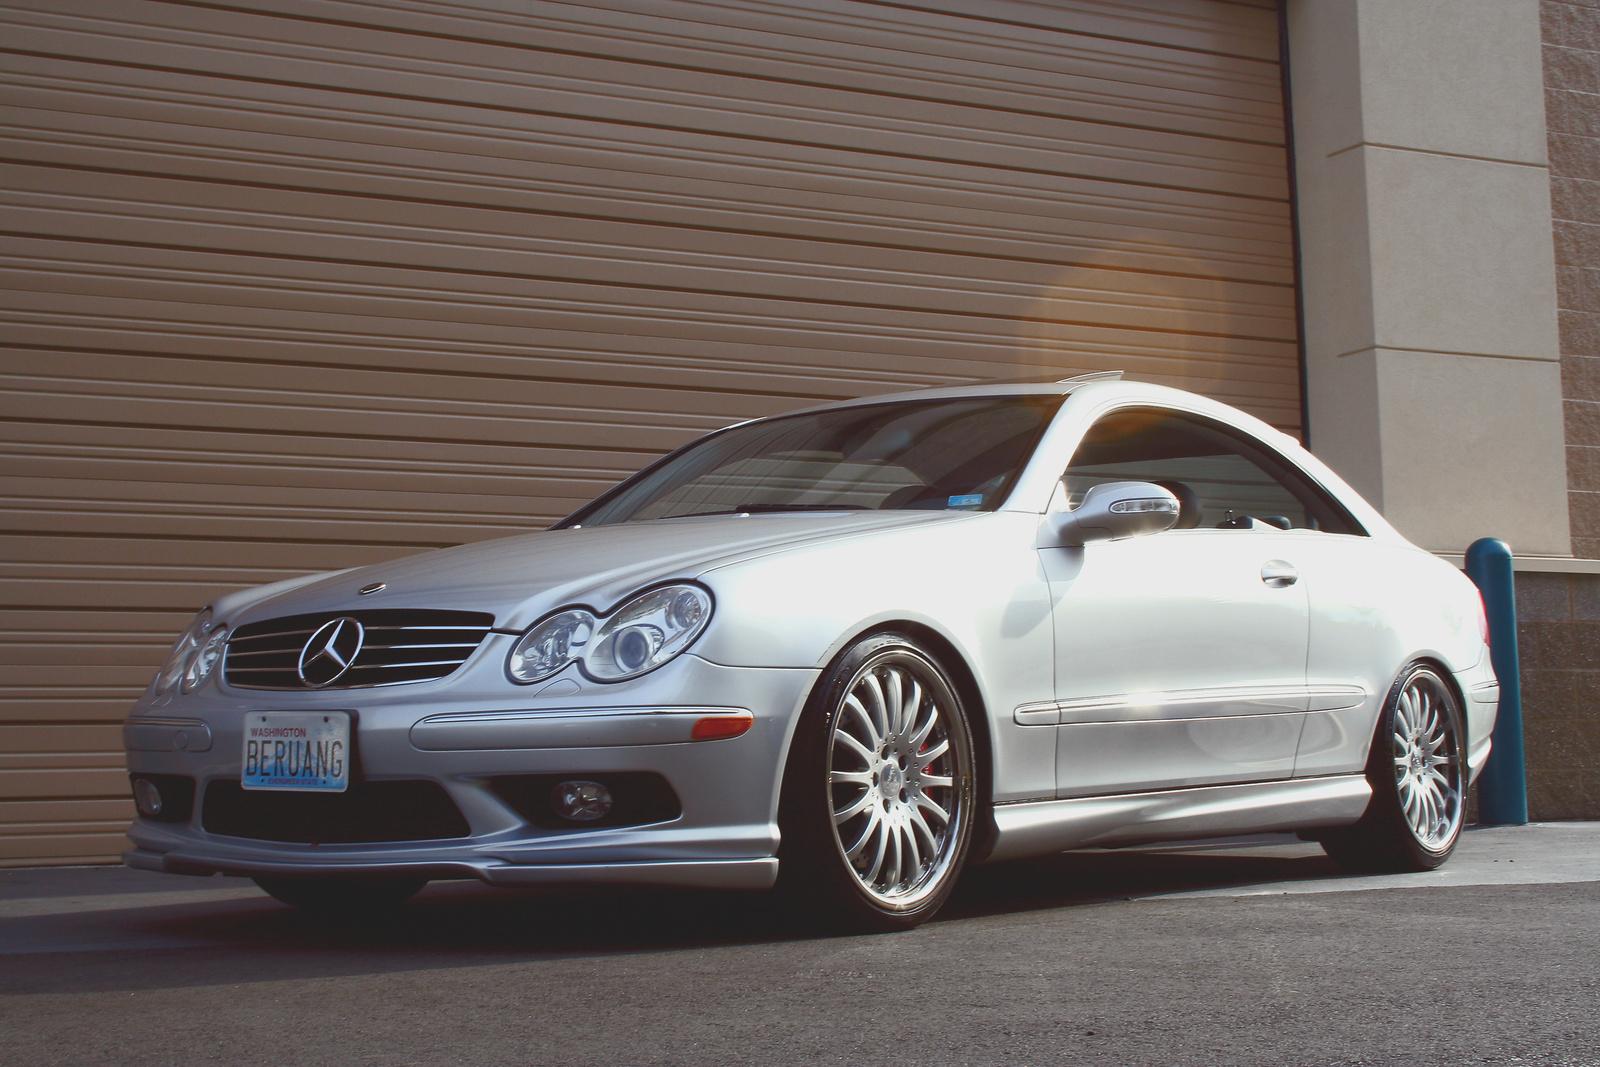 2003 Mercedes Benz Clk Class Pictures Cargurus